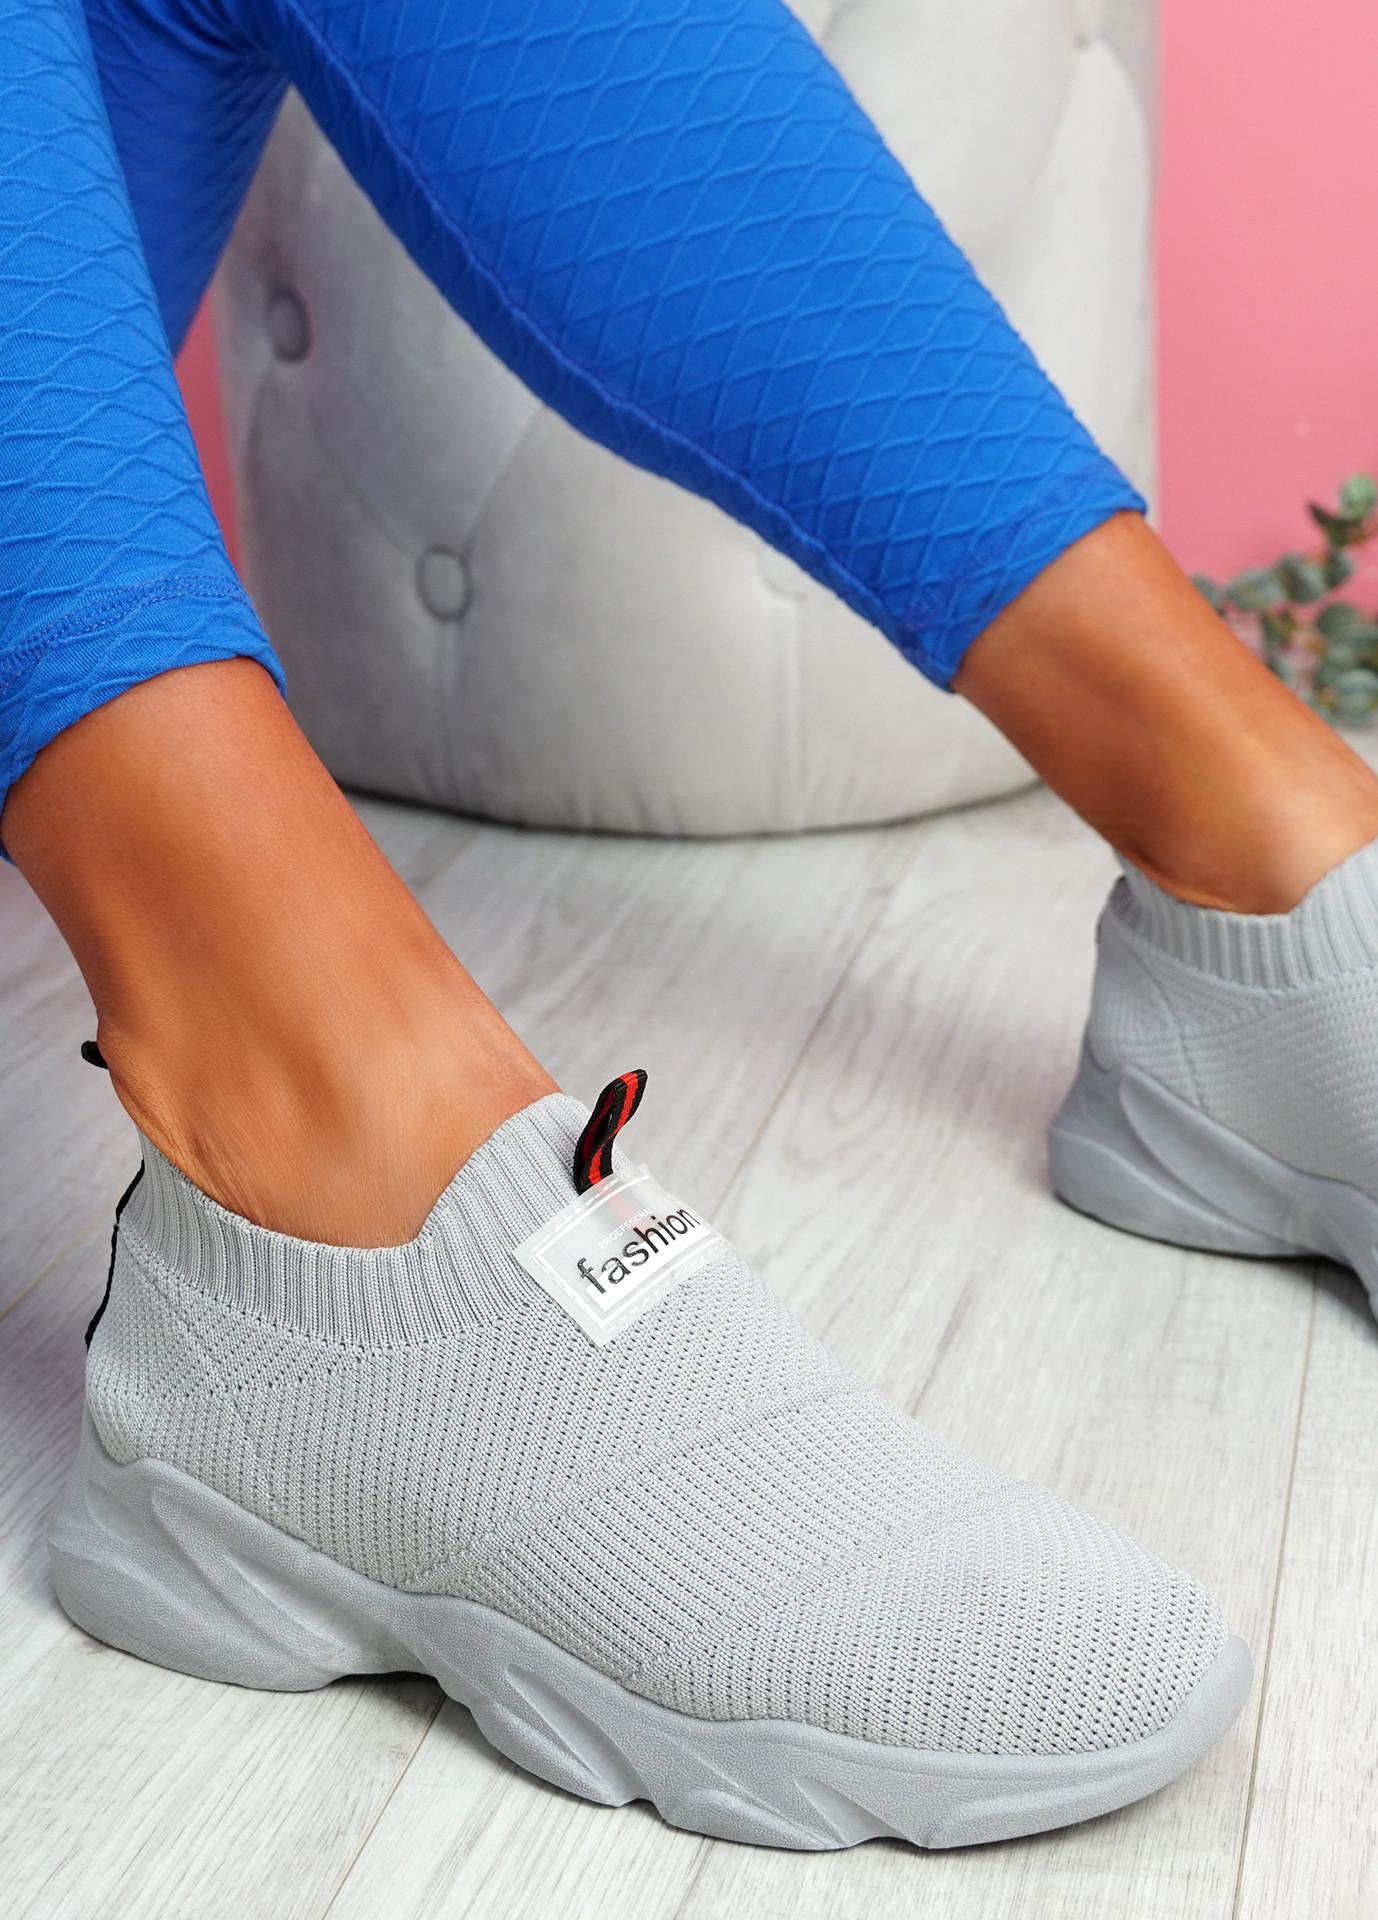 Vidy Grey Knit Trainers